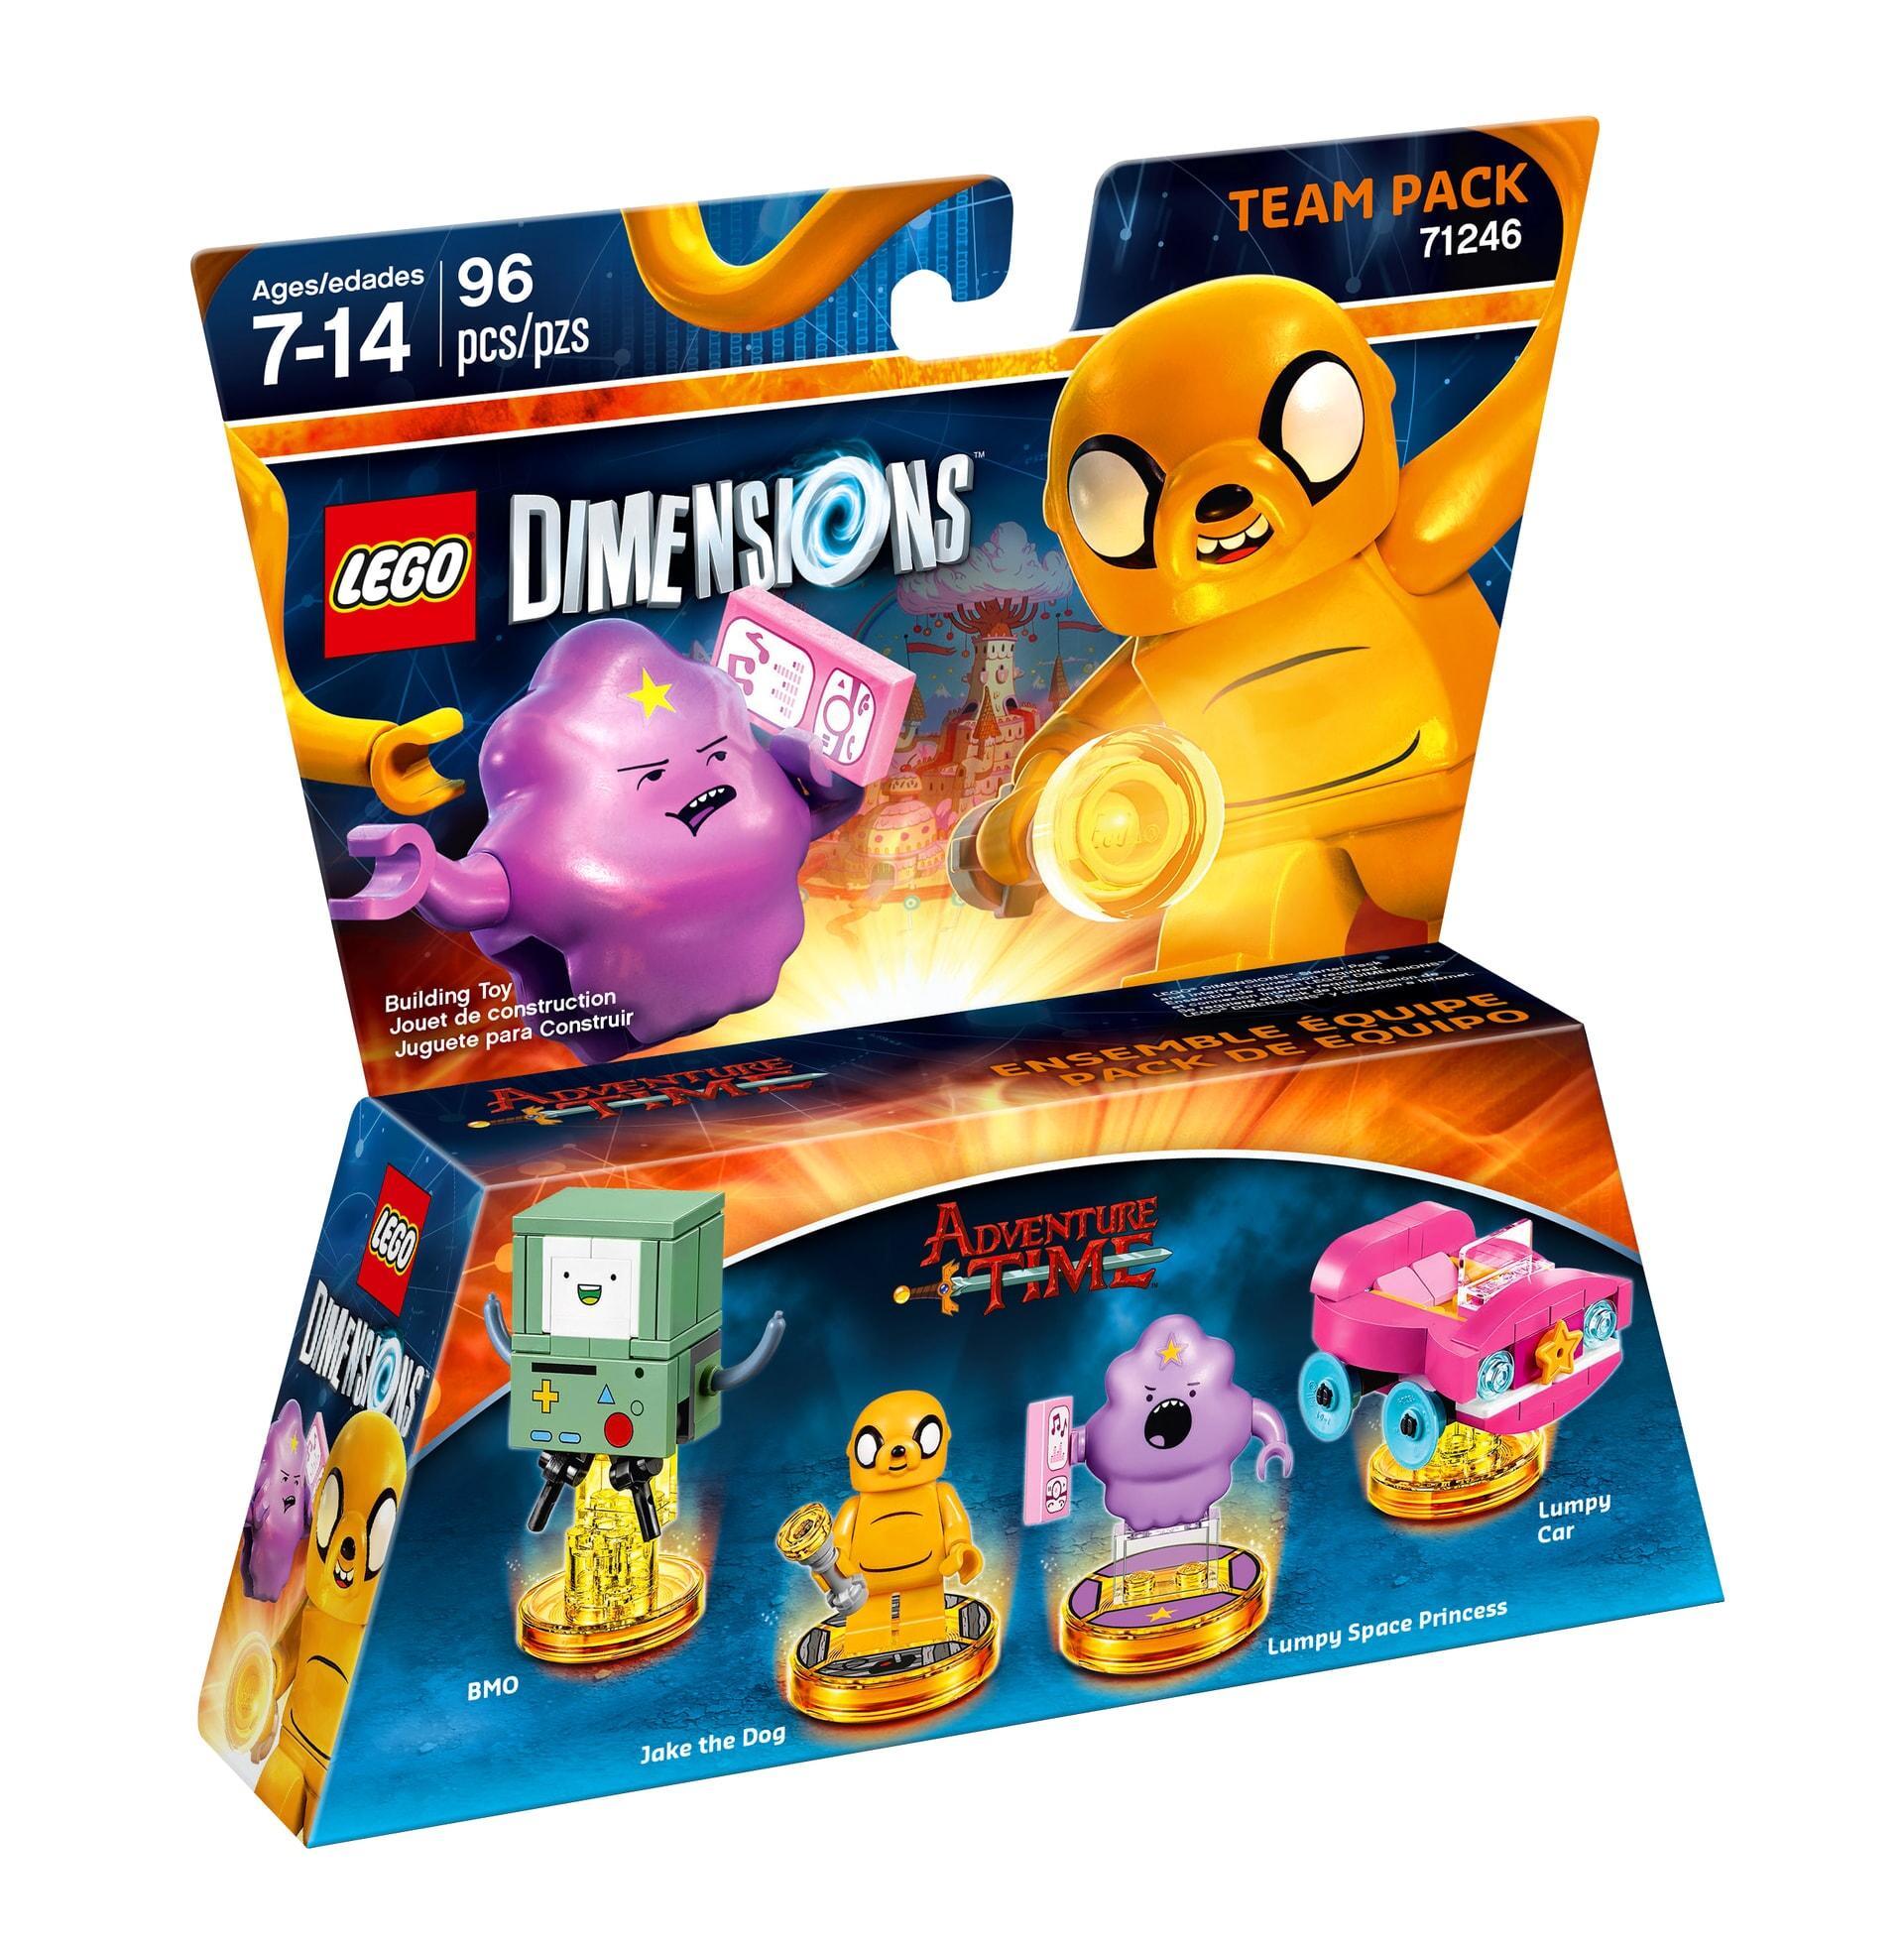 LEGO Dimensions Expansion Pack: Adventuretime